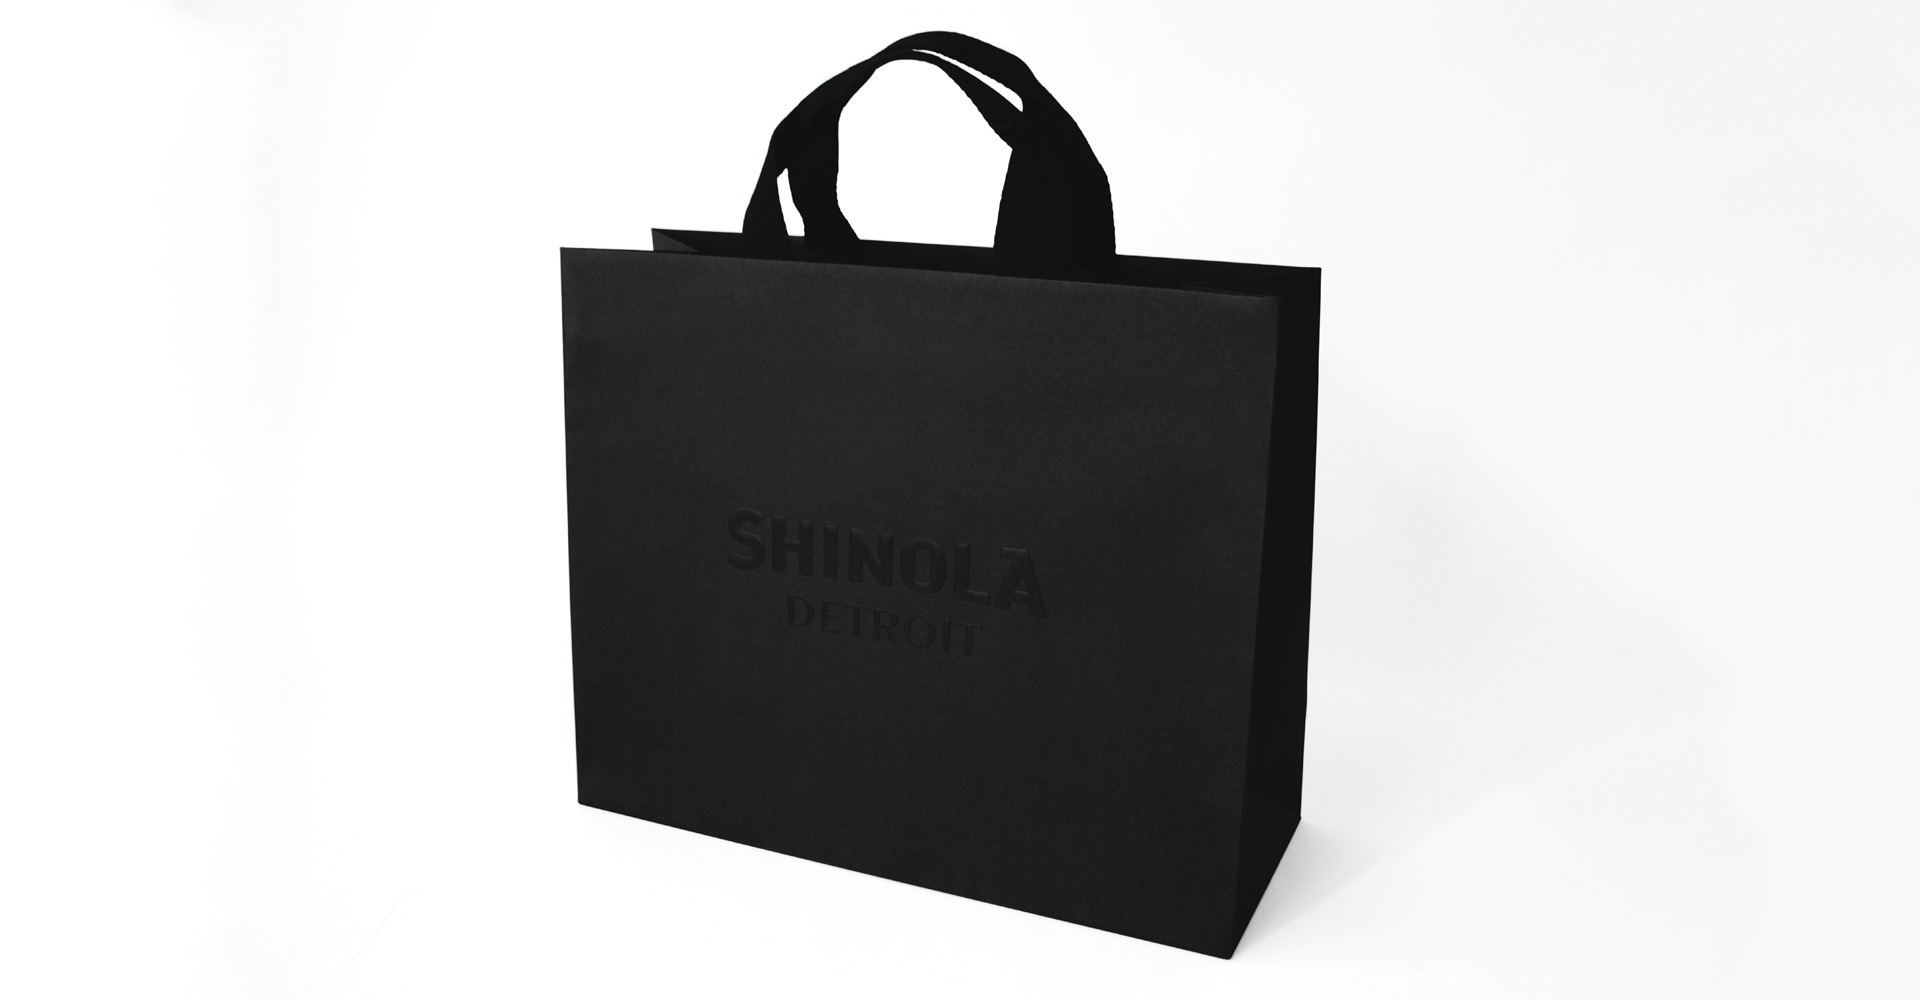 Creative_Retail_Packaging_Custom_Luxury_Design_Shinola_07.jpg